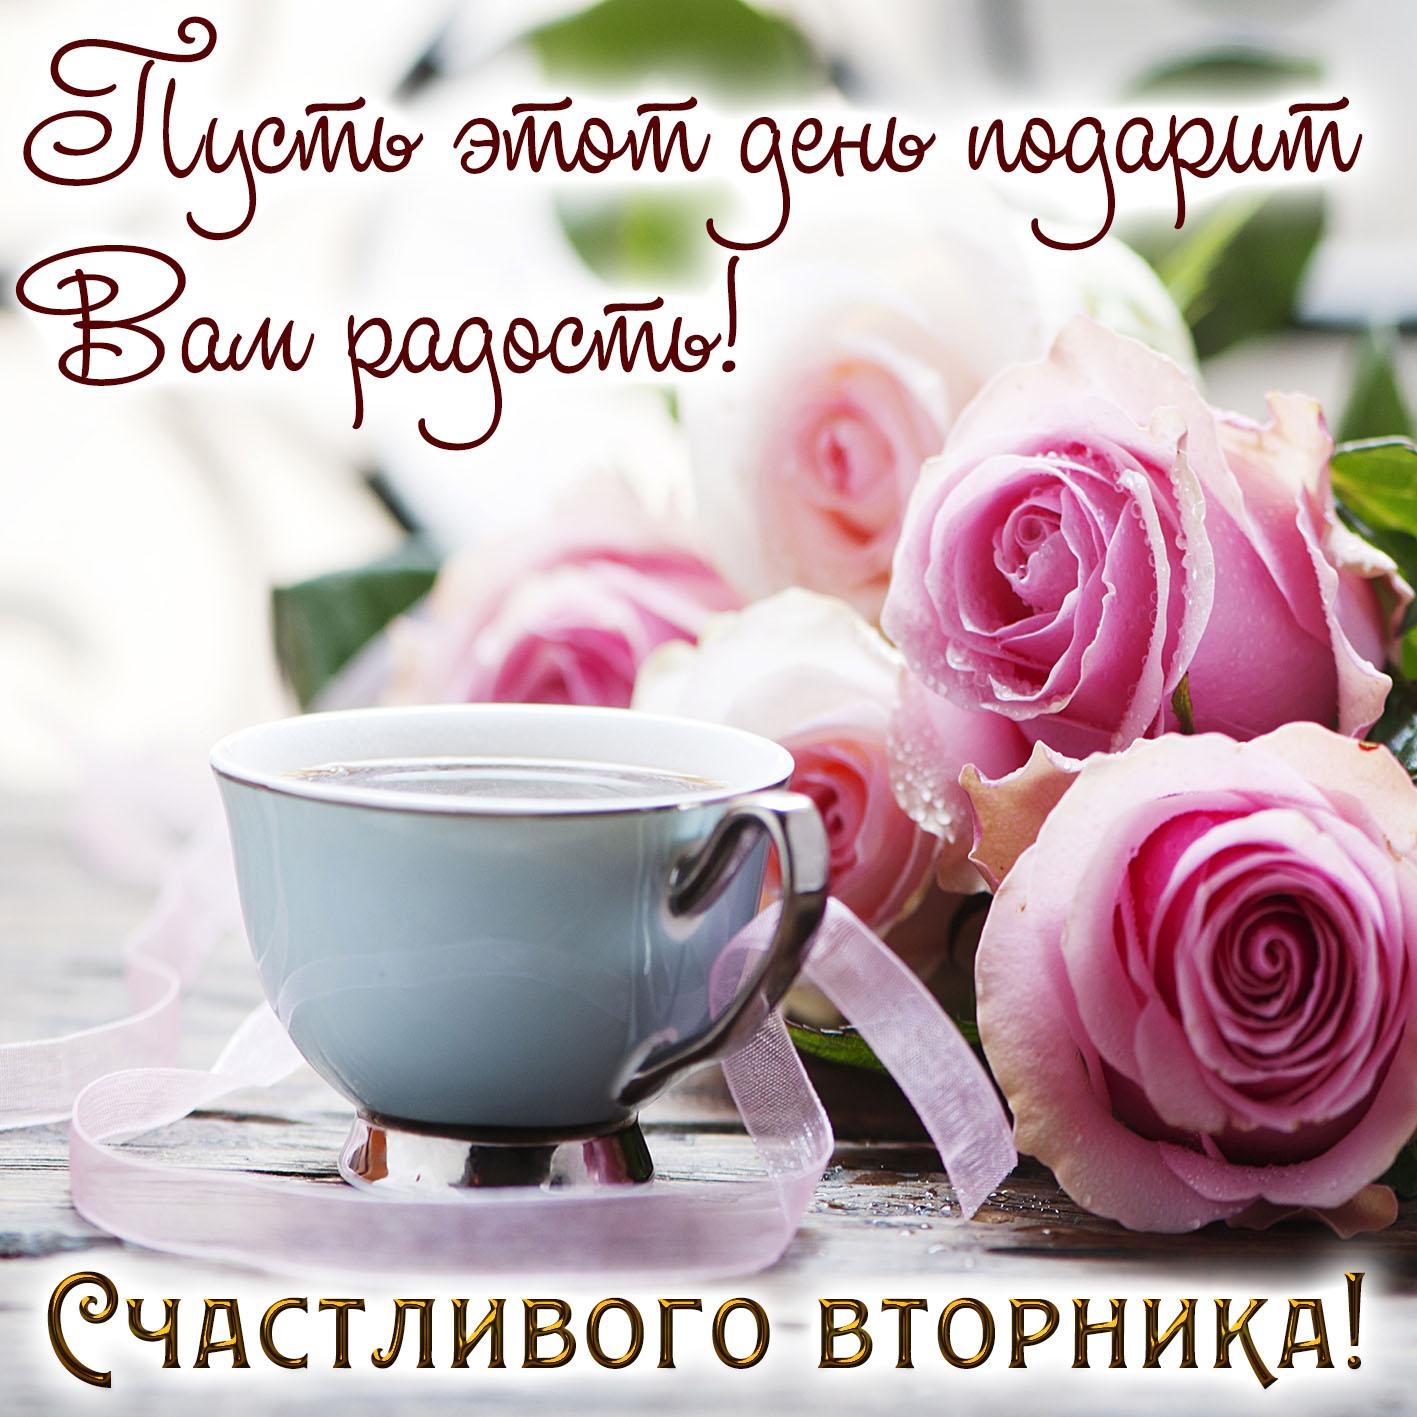 Открытка счастливого нового дня